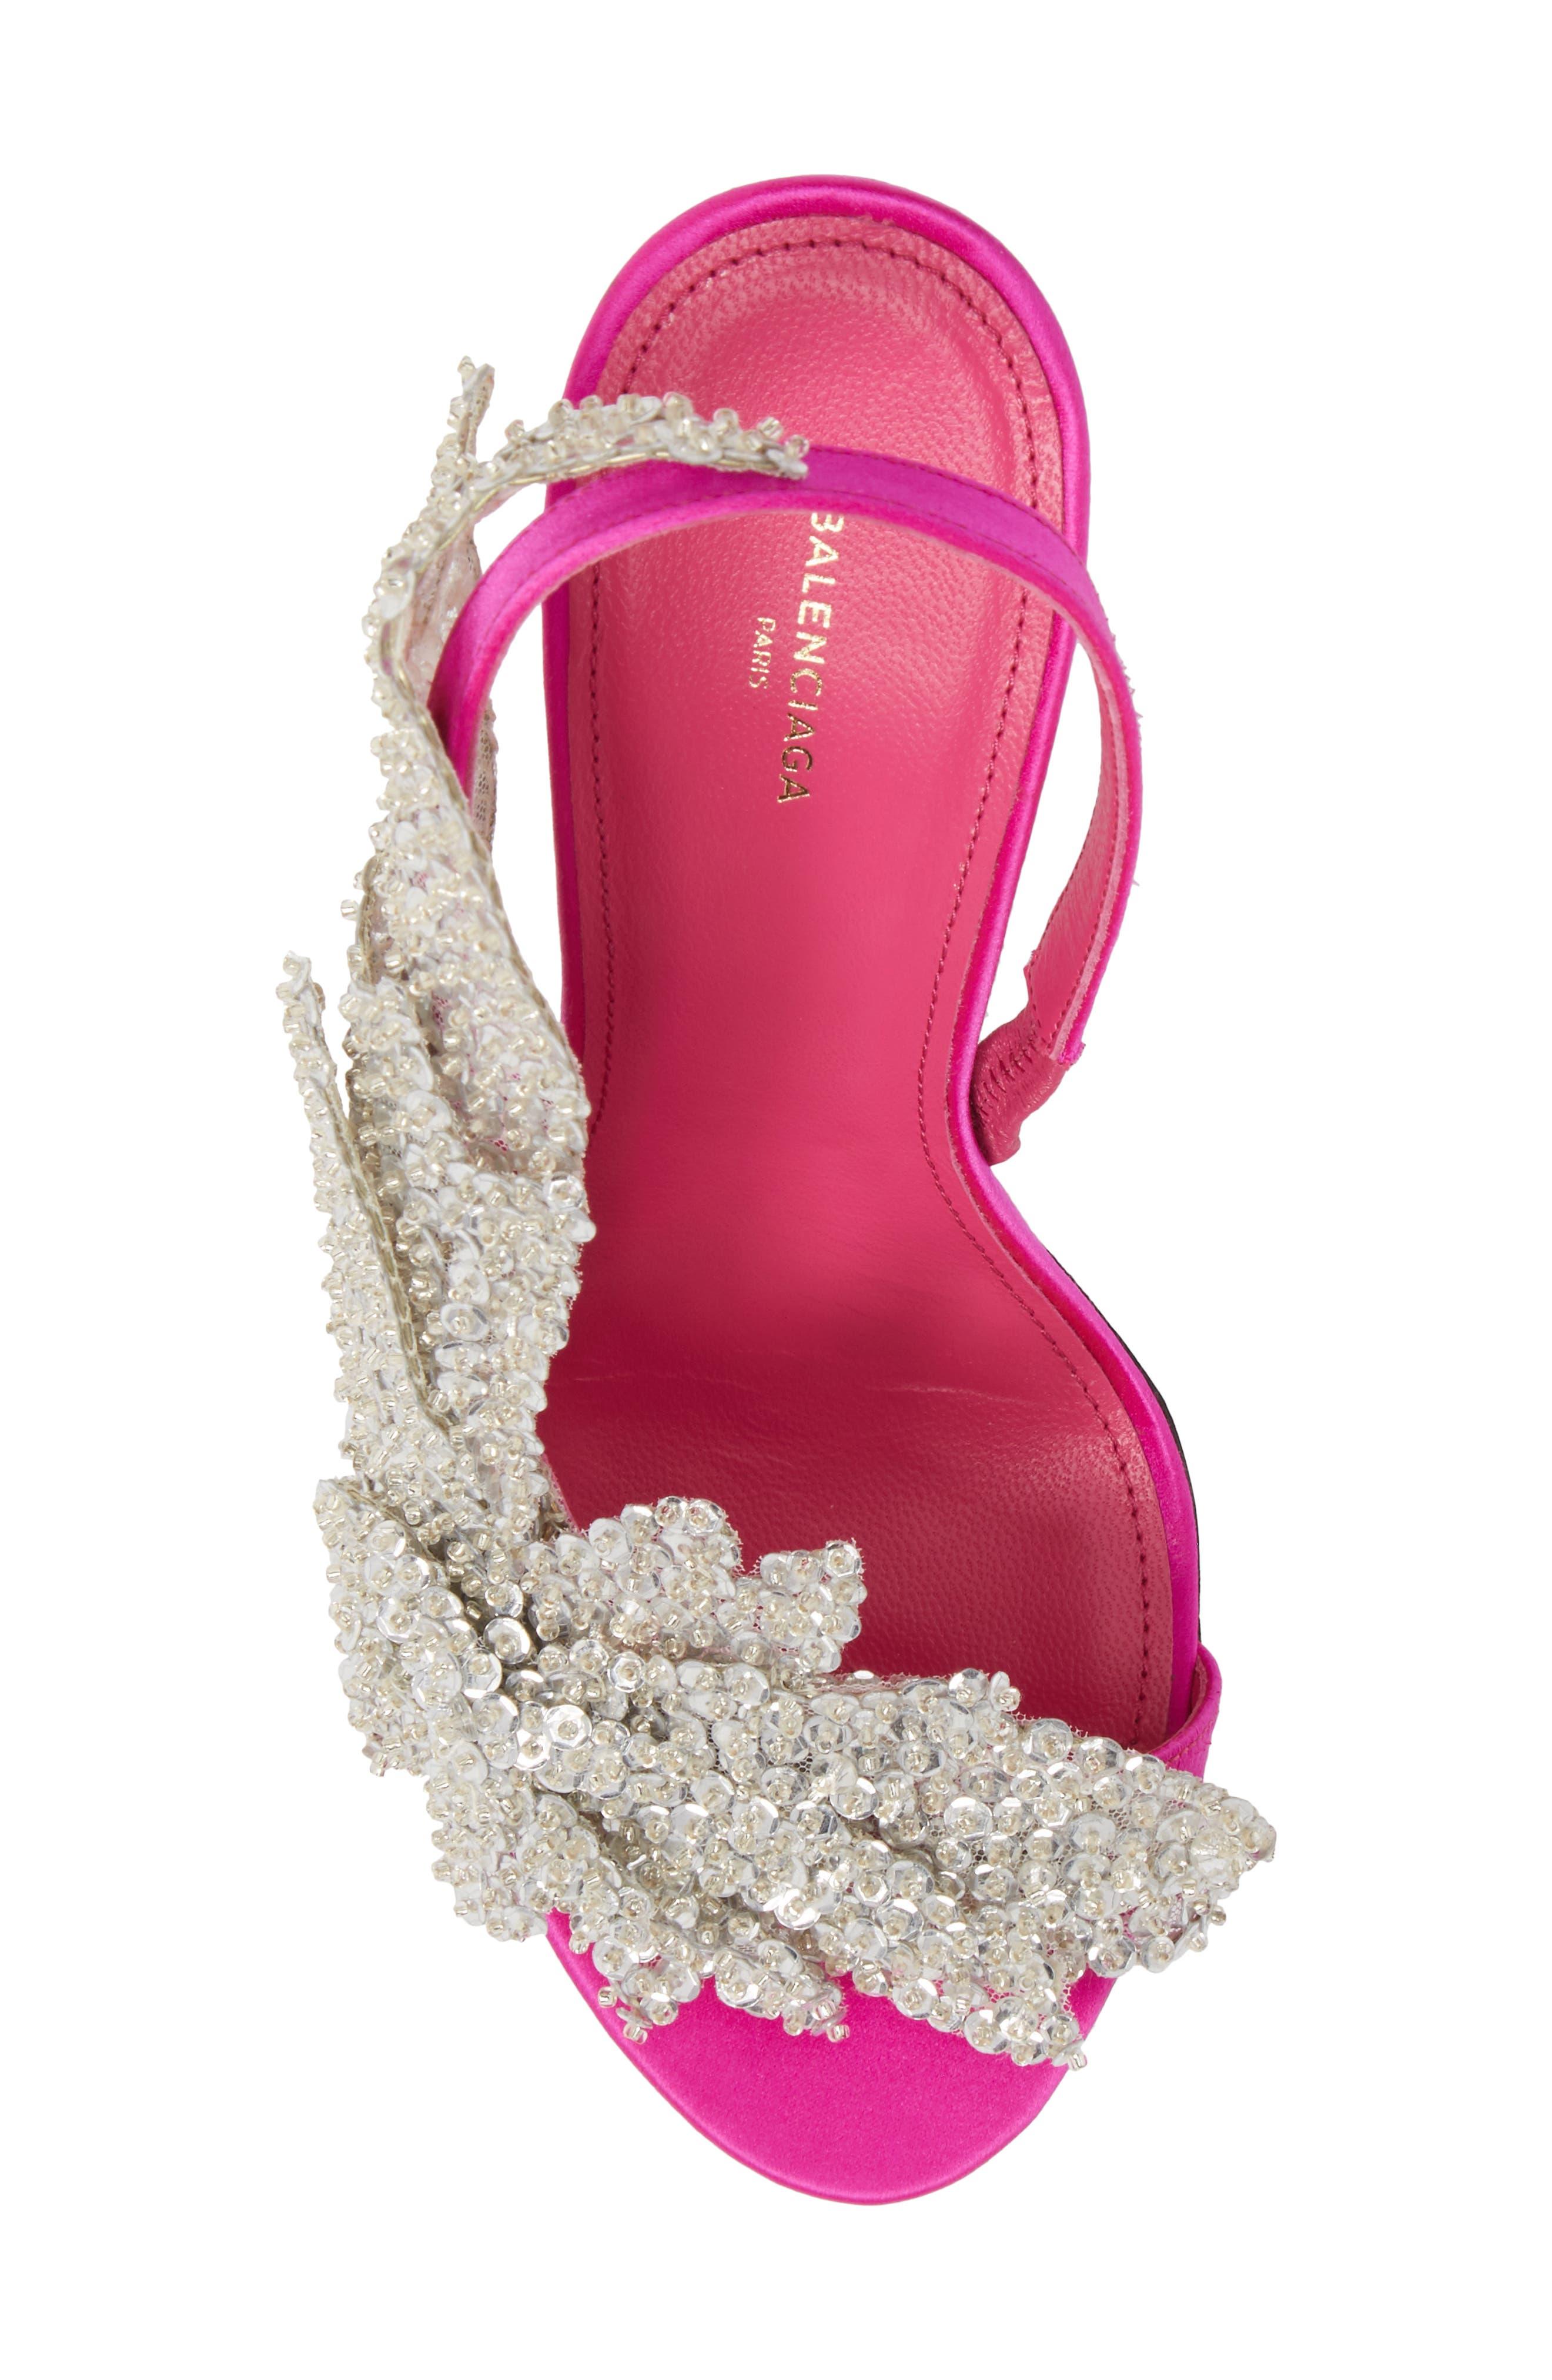 Embellished Slingback Sandal,                             Alternate thumbnail 5, color,                             Rose Fuchsia/ Crystal